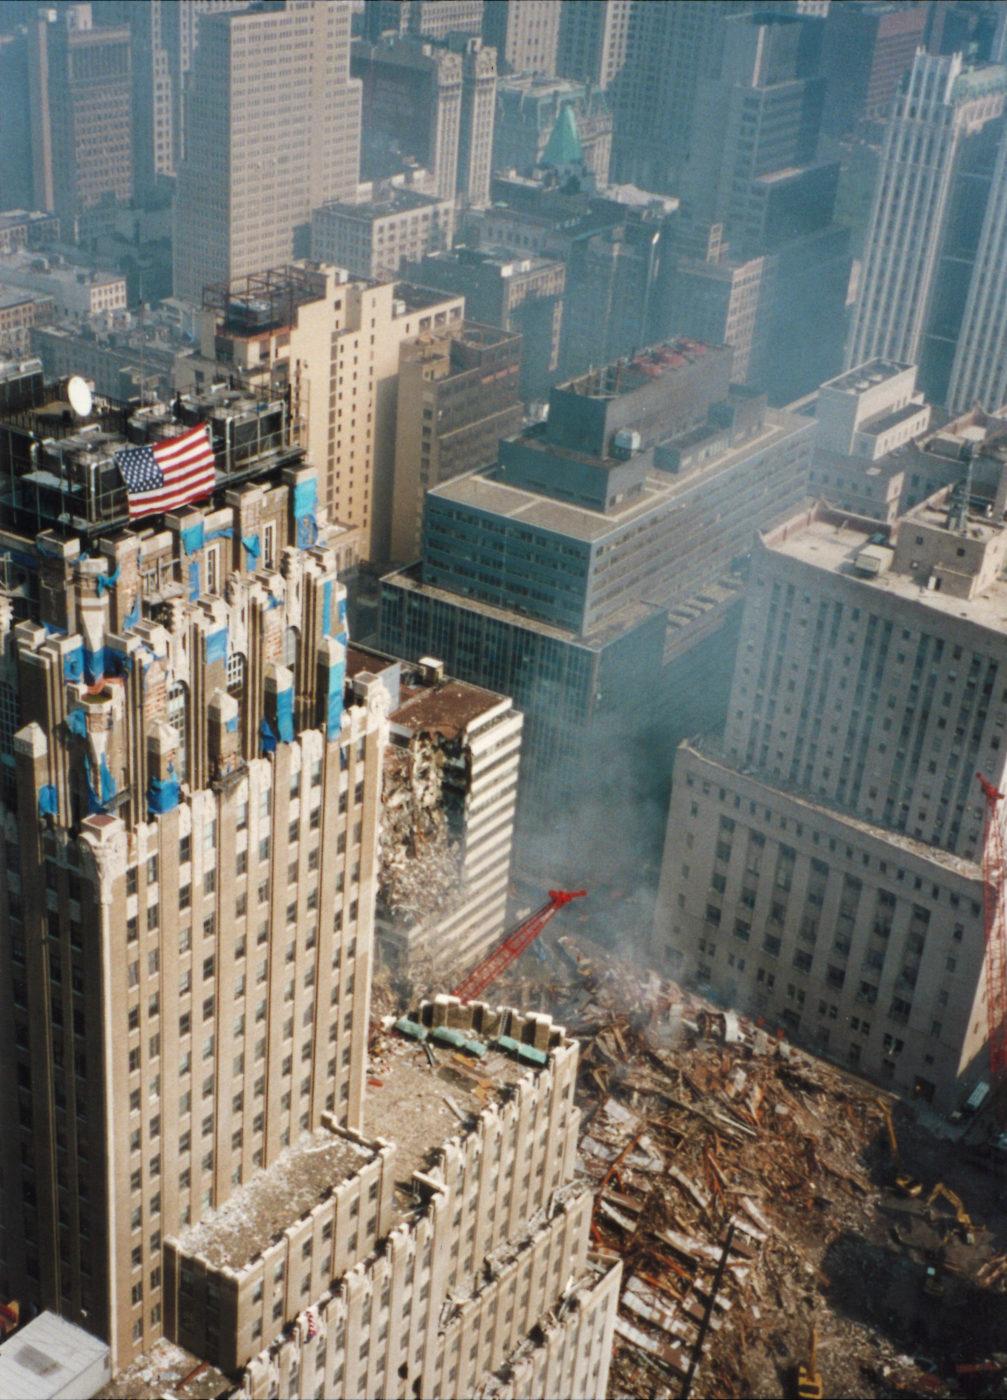 Overlooking Ground Zero